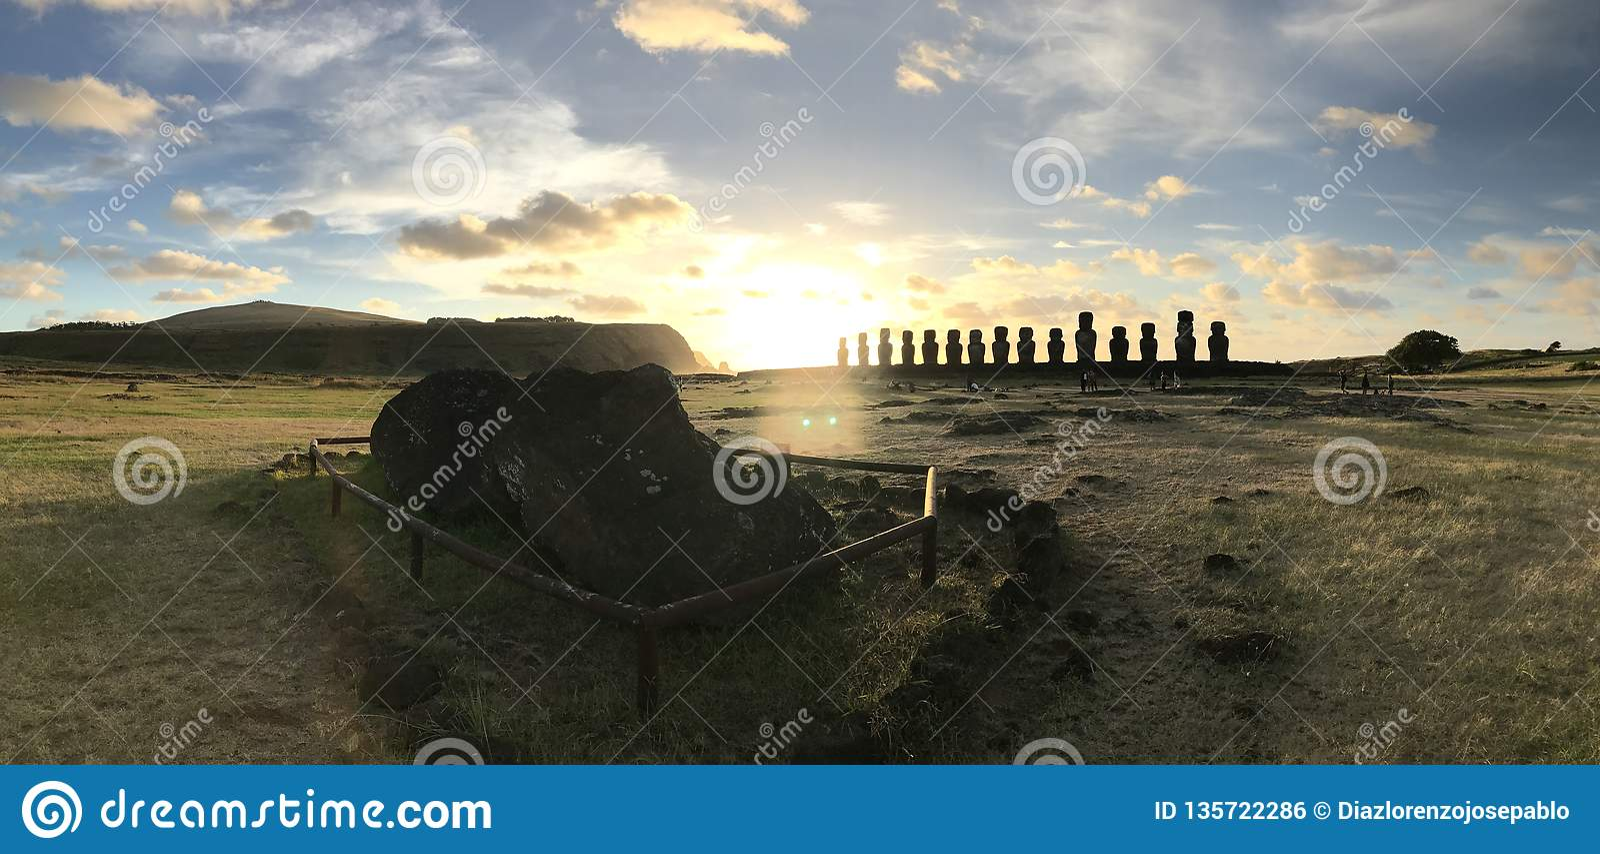 Easter Island - Rapa Nui - AHU TONGARIKI - JPDL